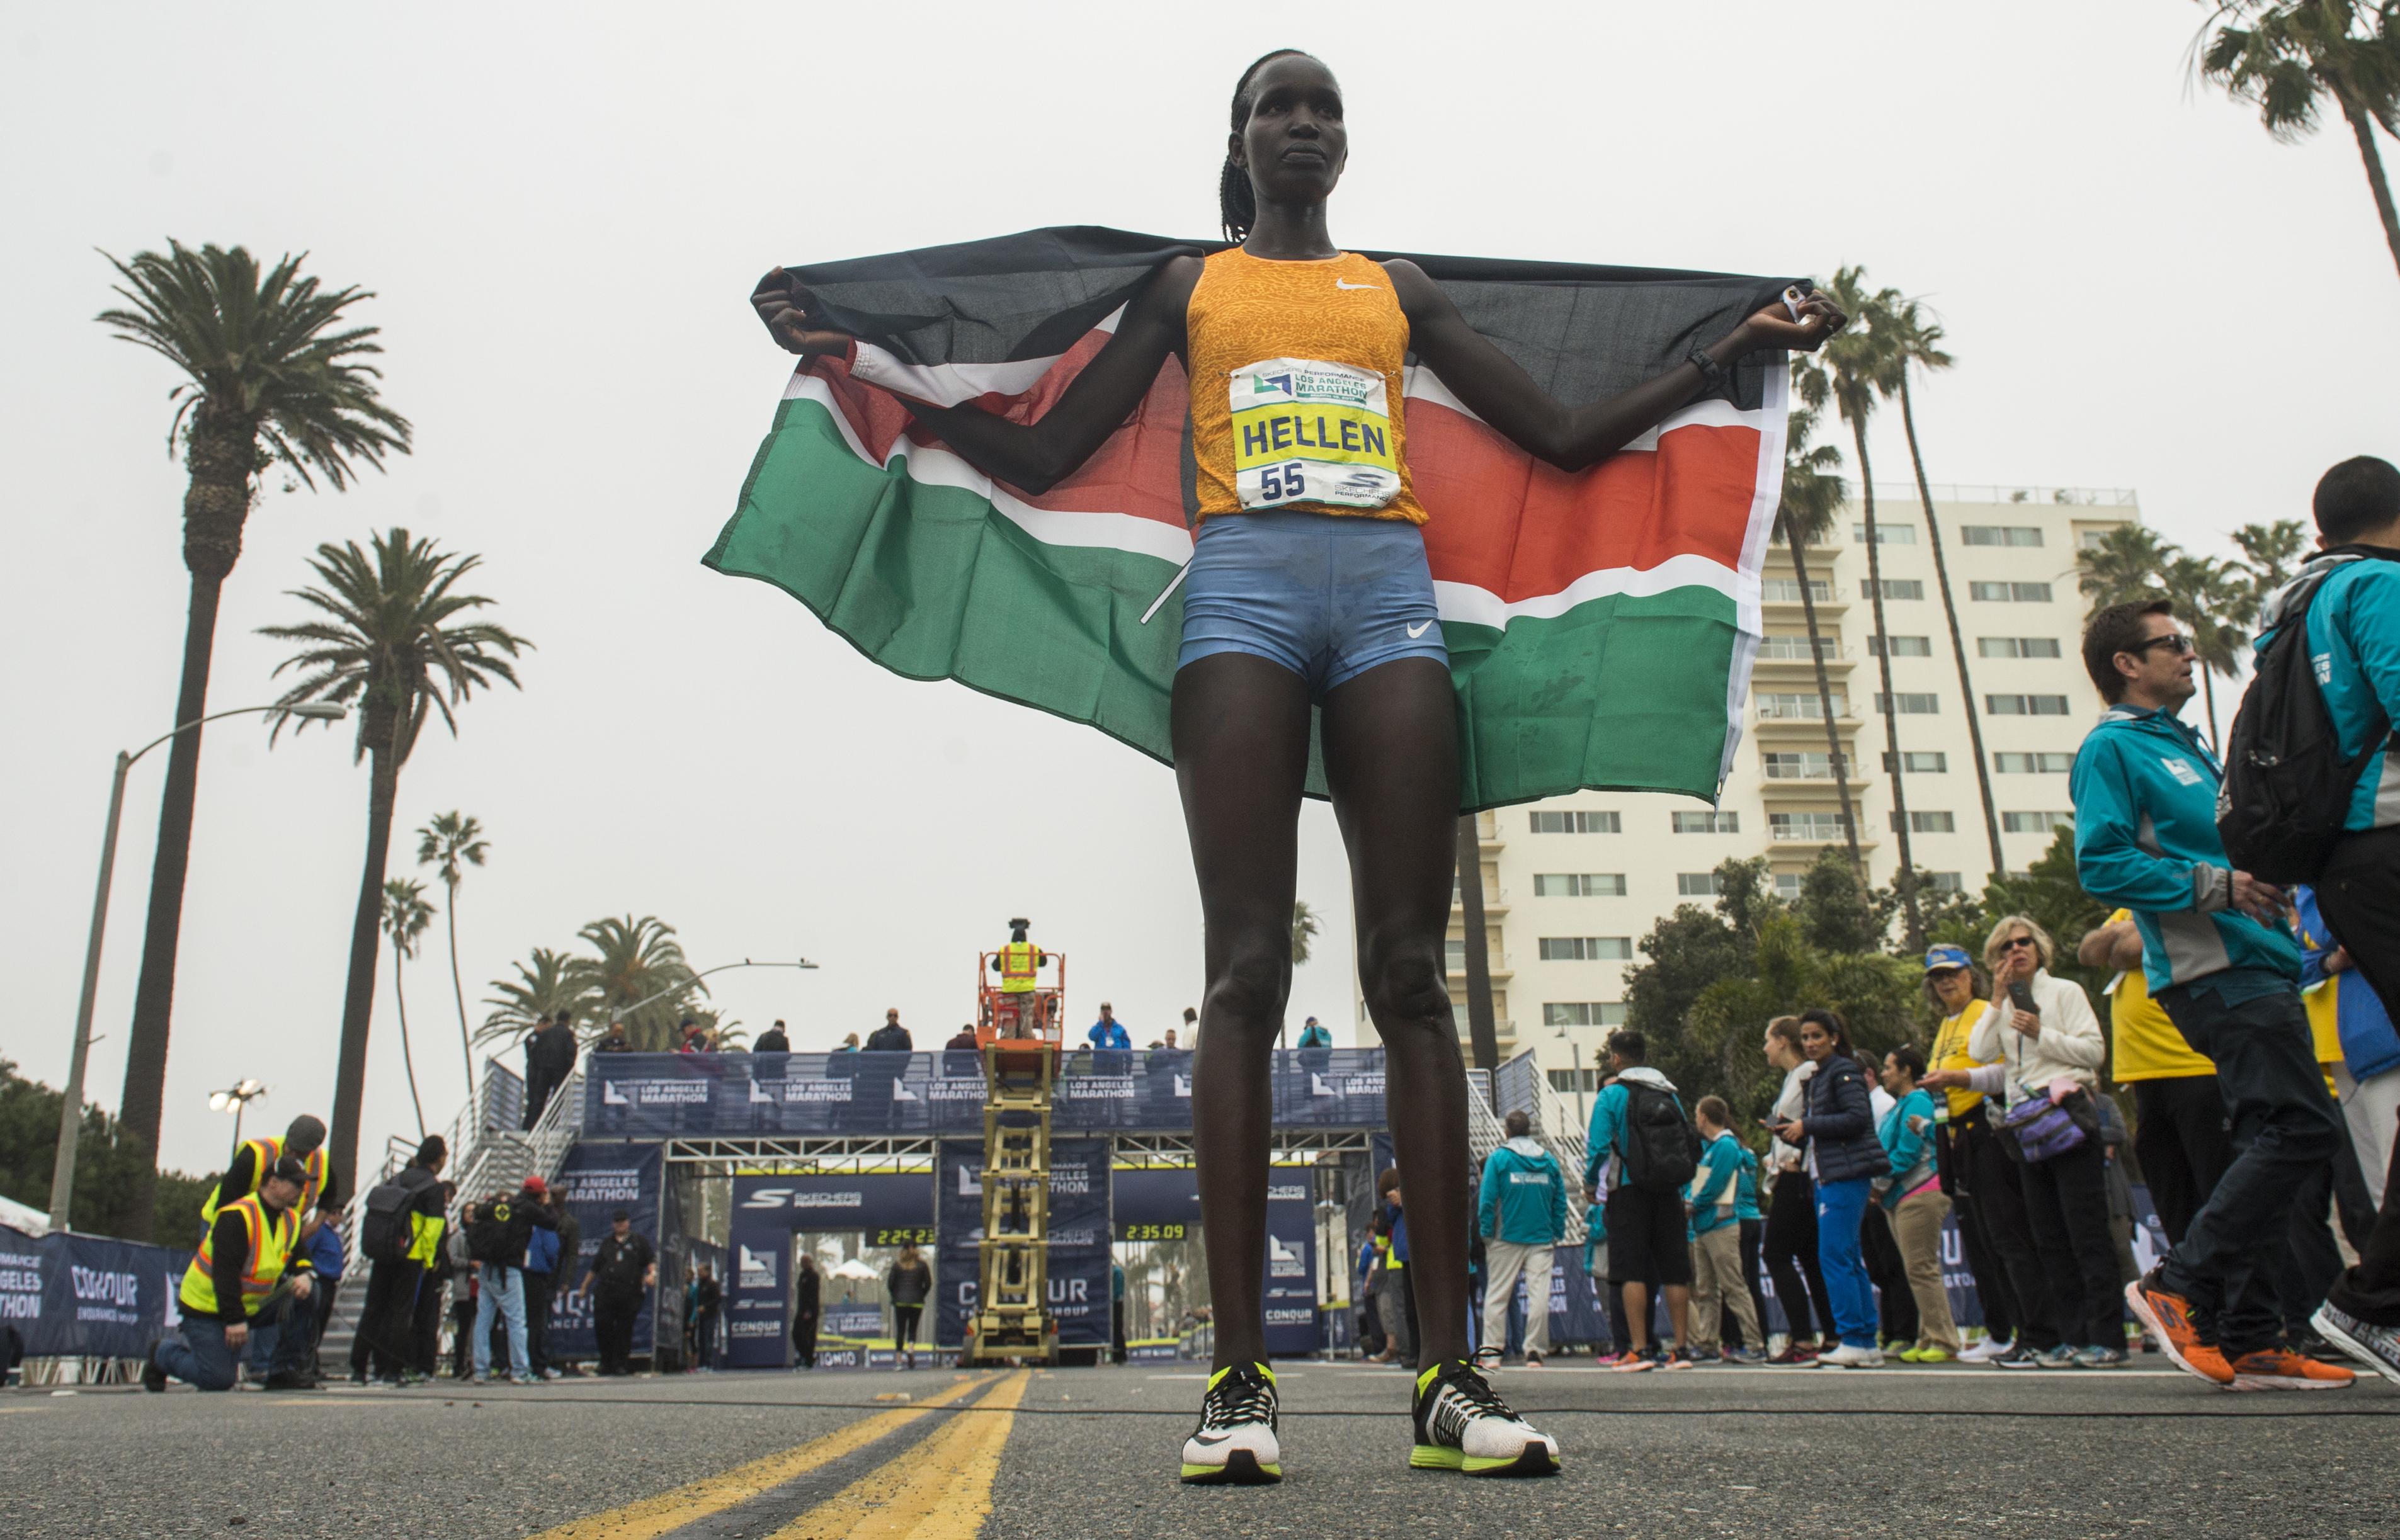 LA Marathon: Kenya's Weldon Kirui, Ethiopia's Sule Gedo place 1st